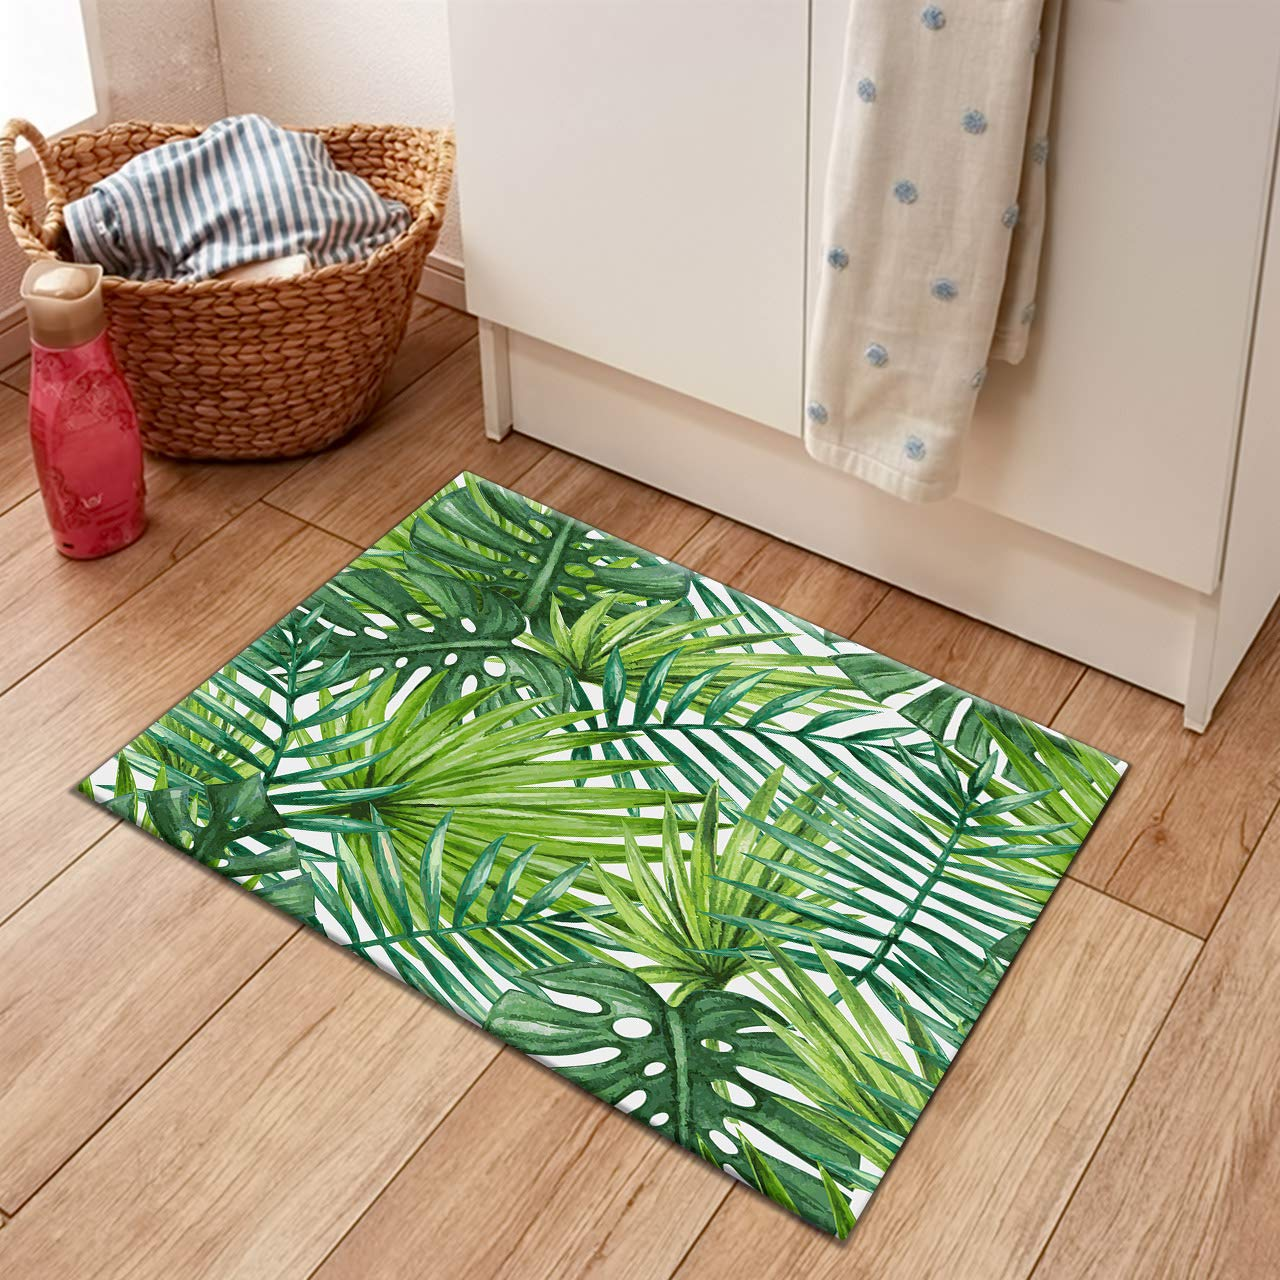 HVEST Green Palm Leaves Area Rugs Tropical Forest Carpet Non-Slip Doormat for Living Room Bedroom Kitchen Floor Mat,(1'8''x2'7'')